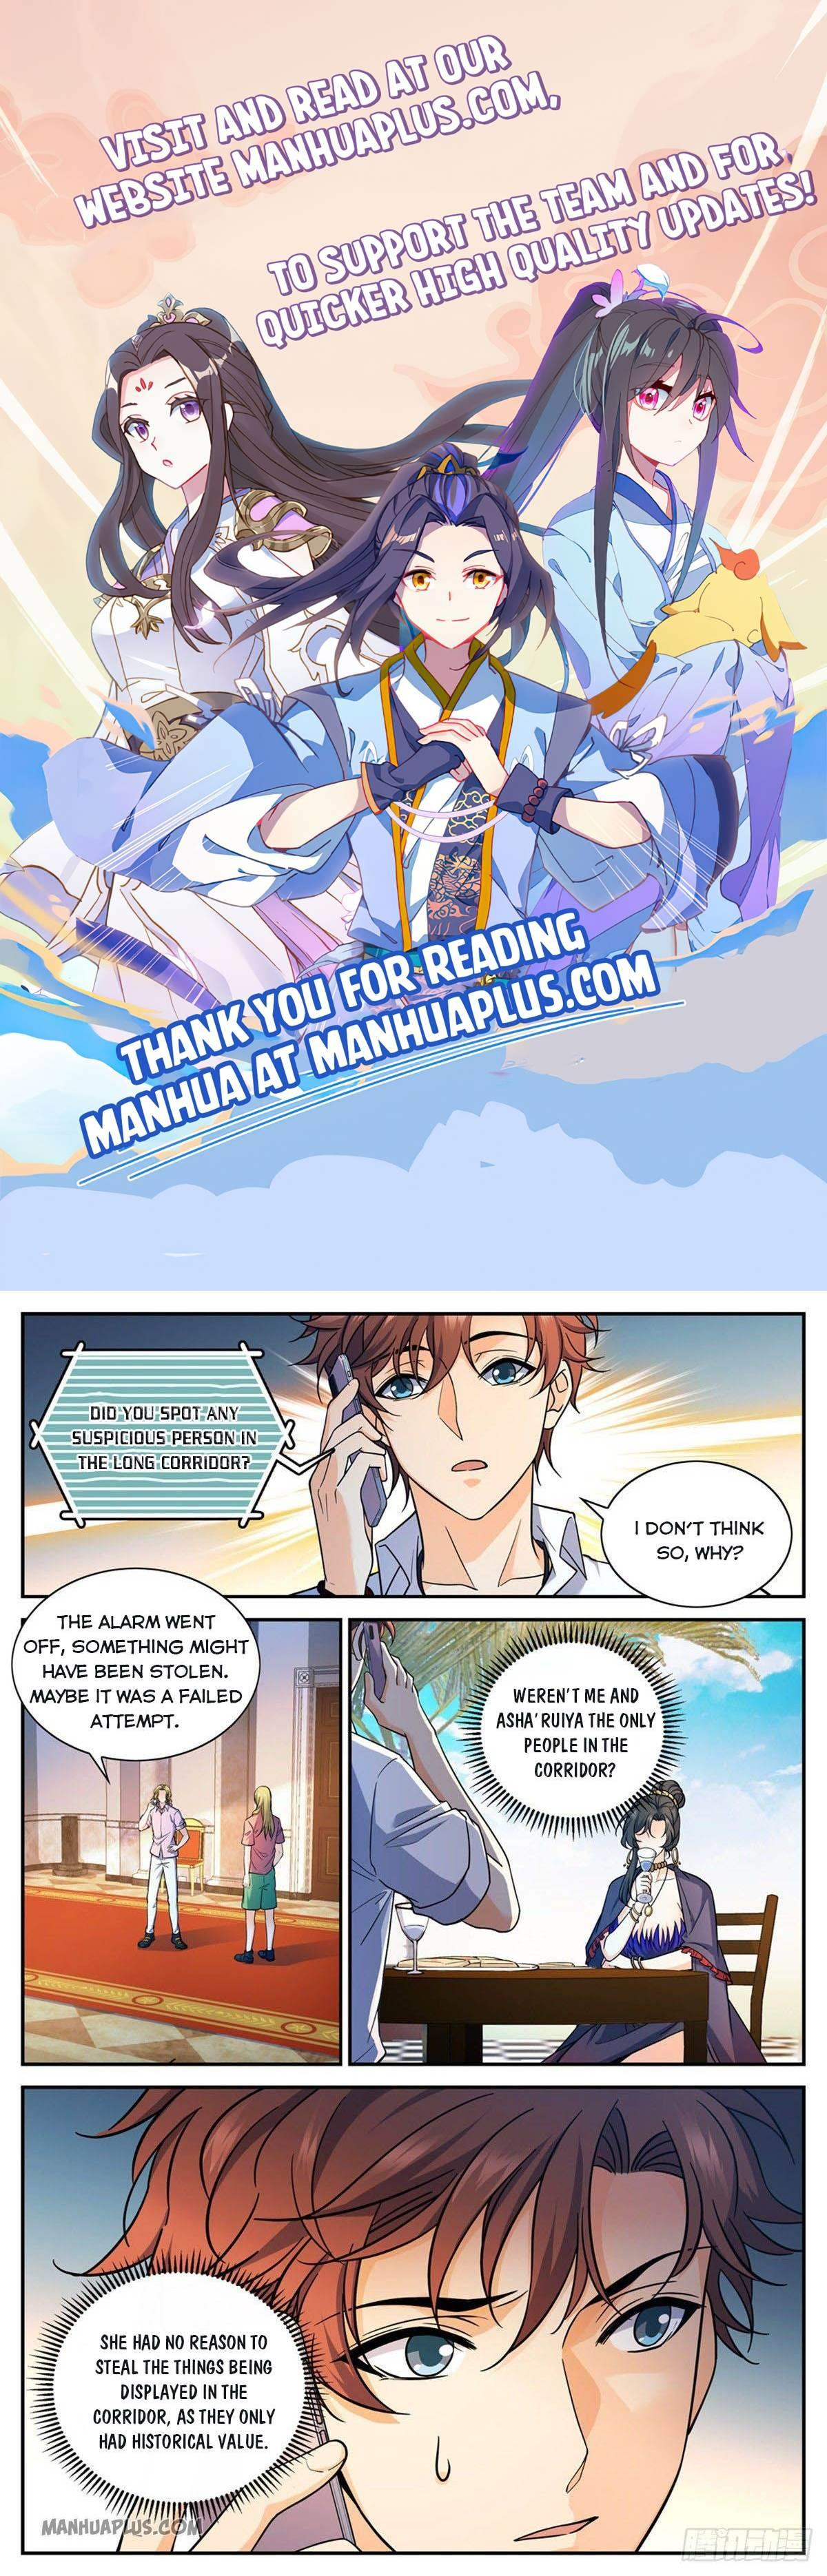 Versatile Mage Chapter 673 page 1 - Mangakakalots.com